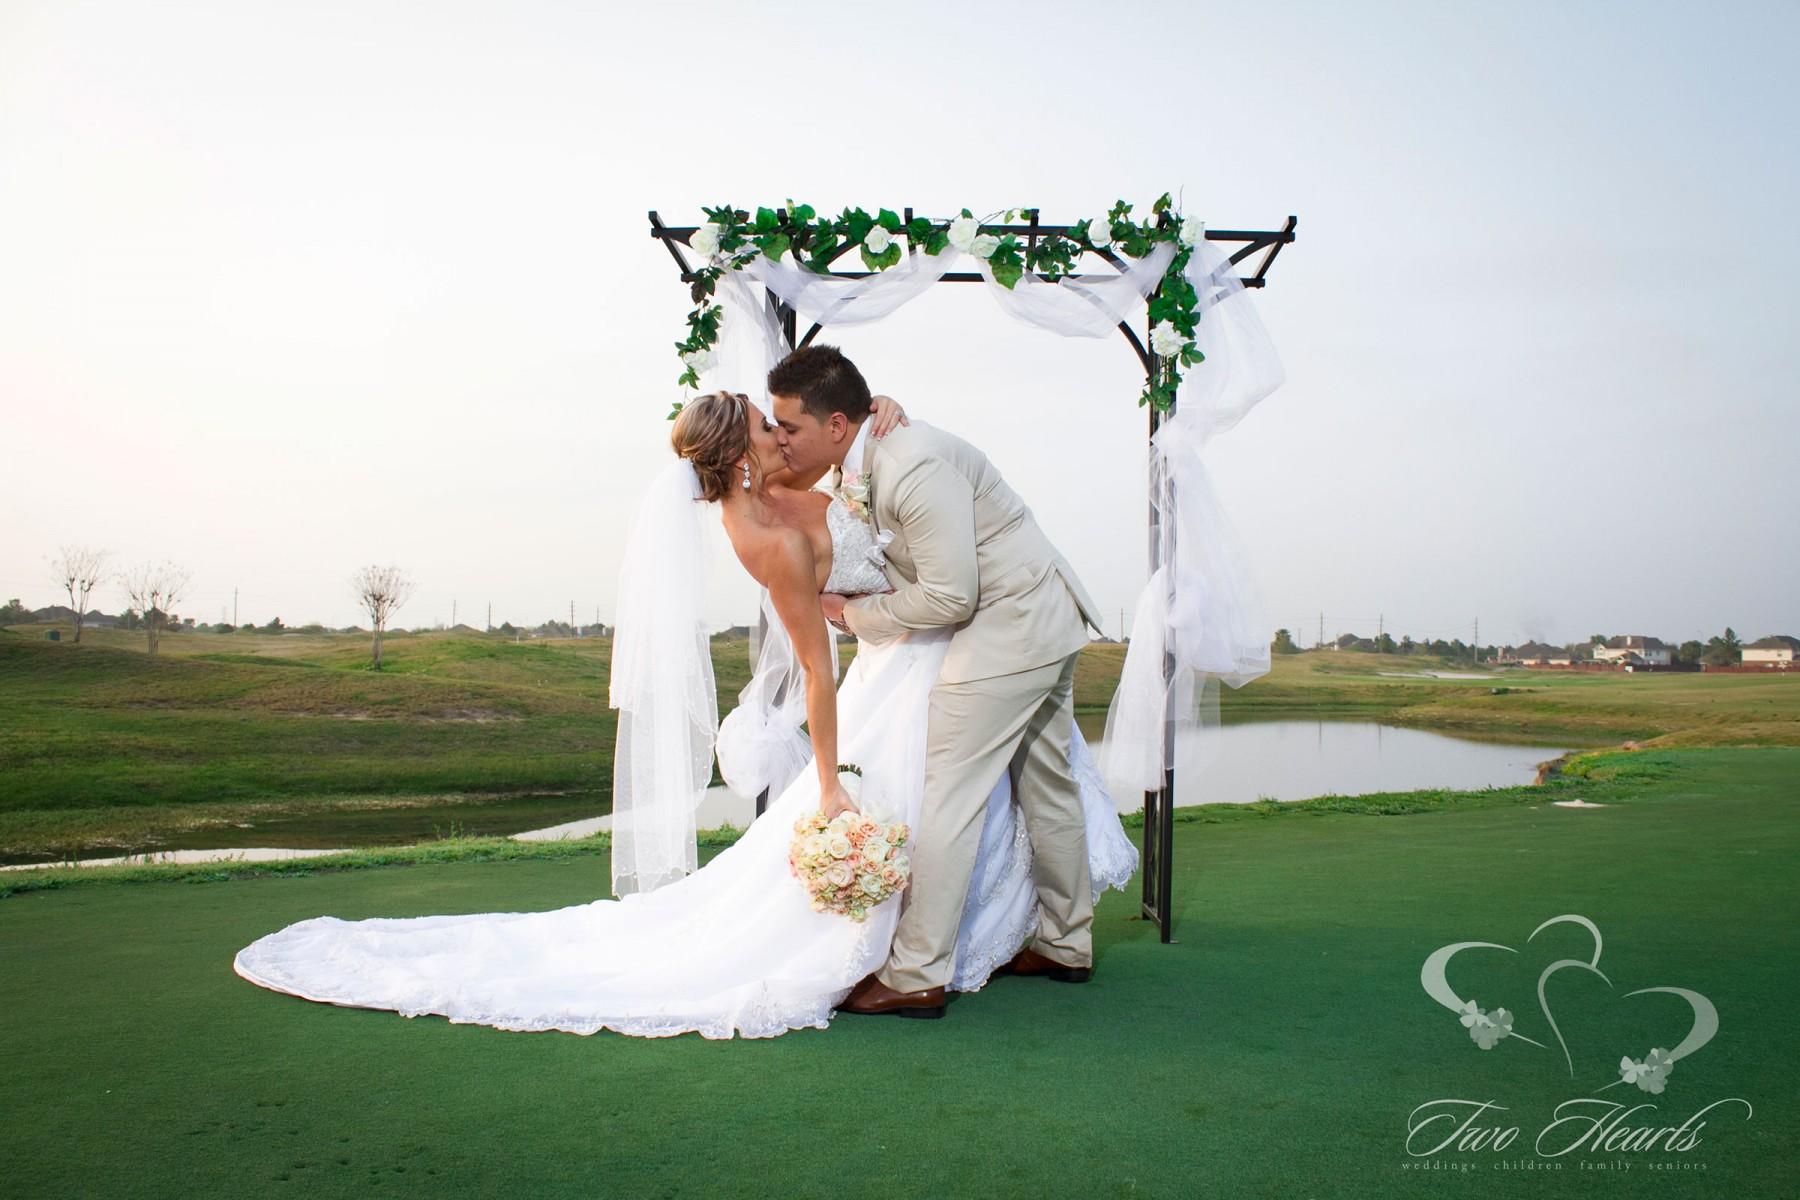 WHY Weddings?